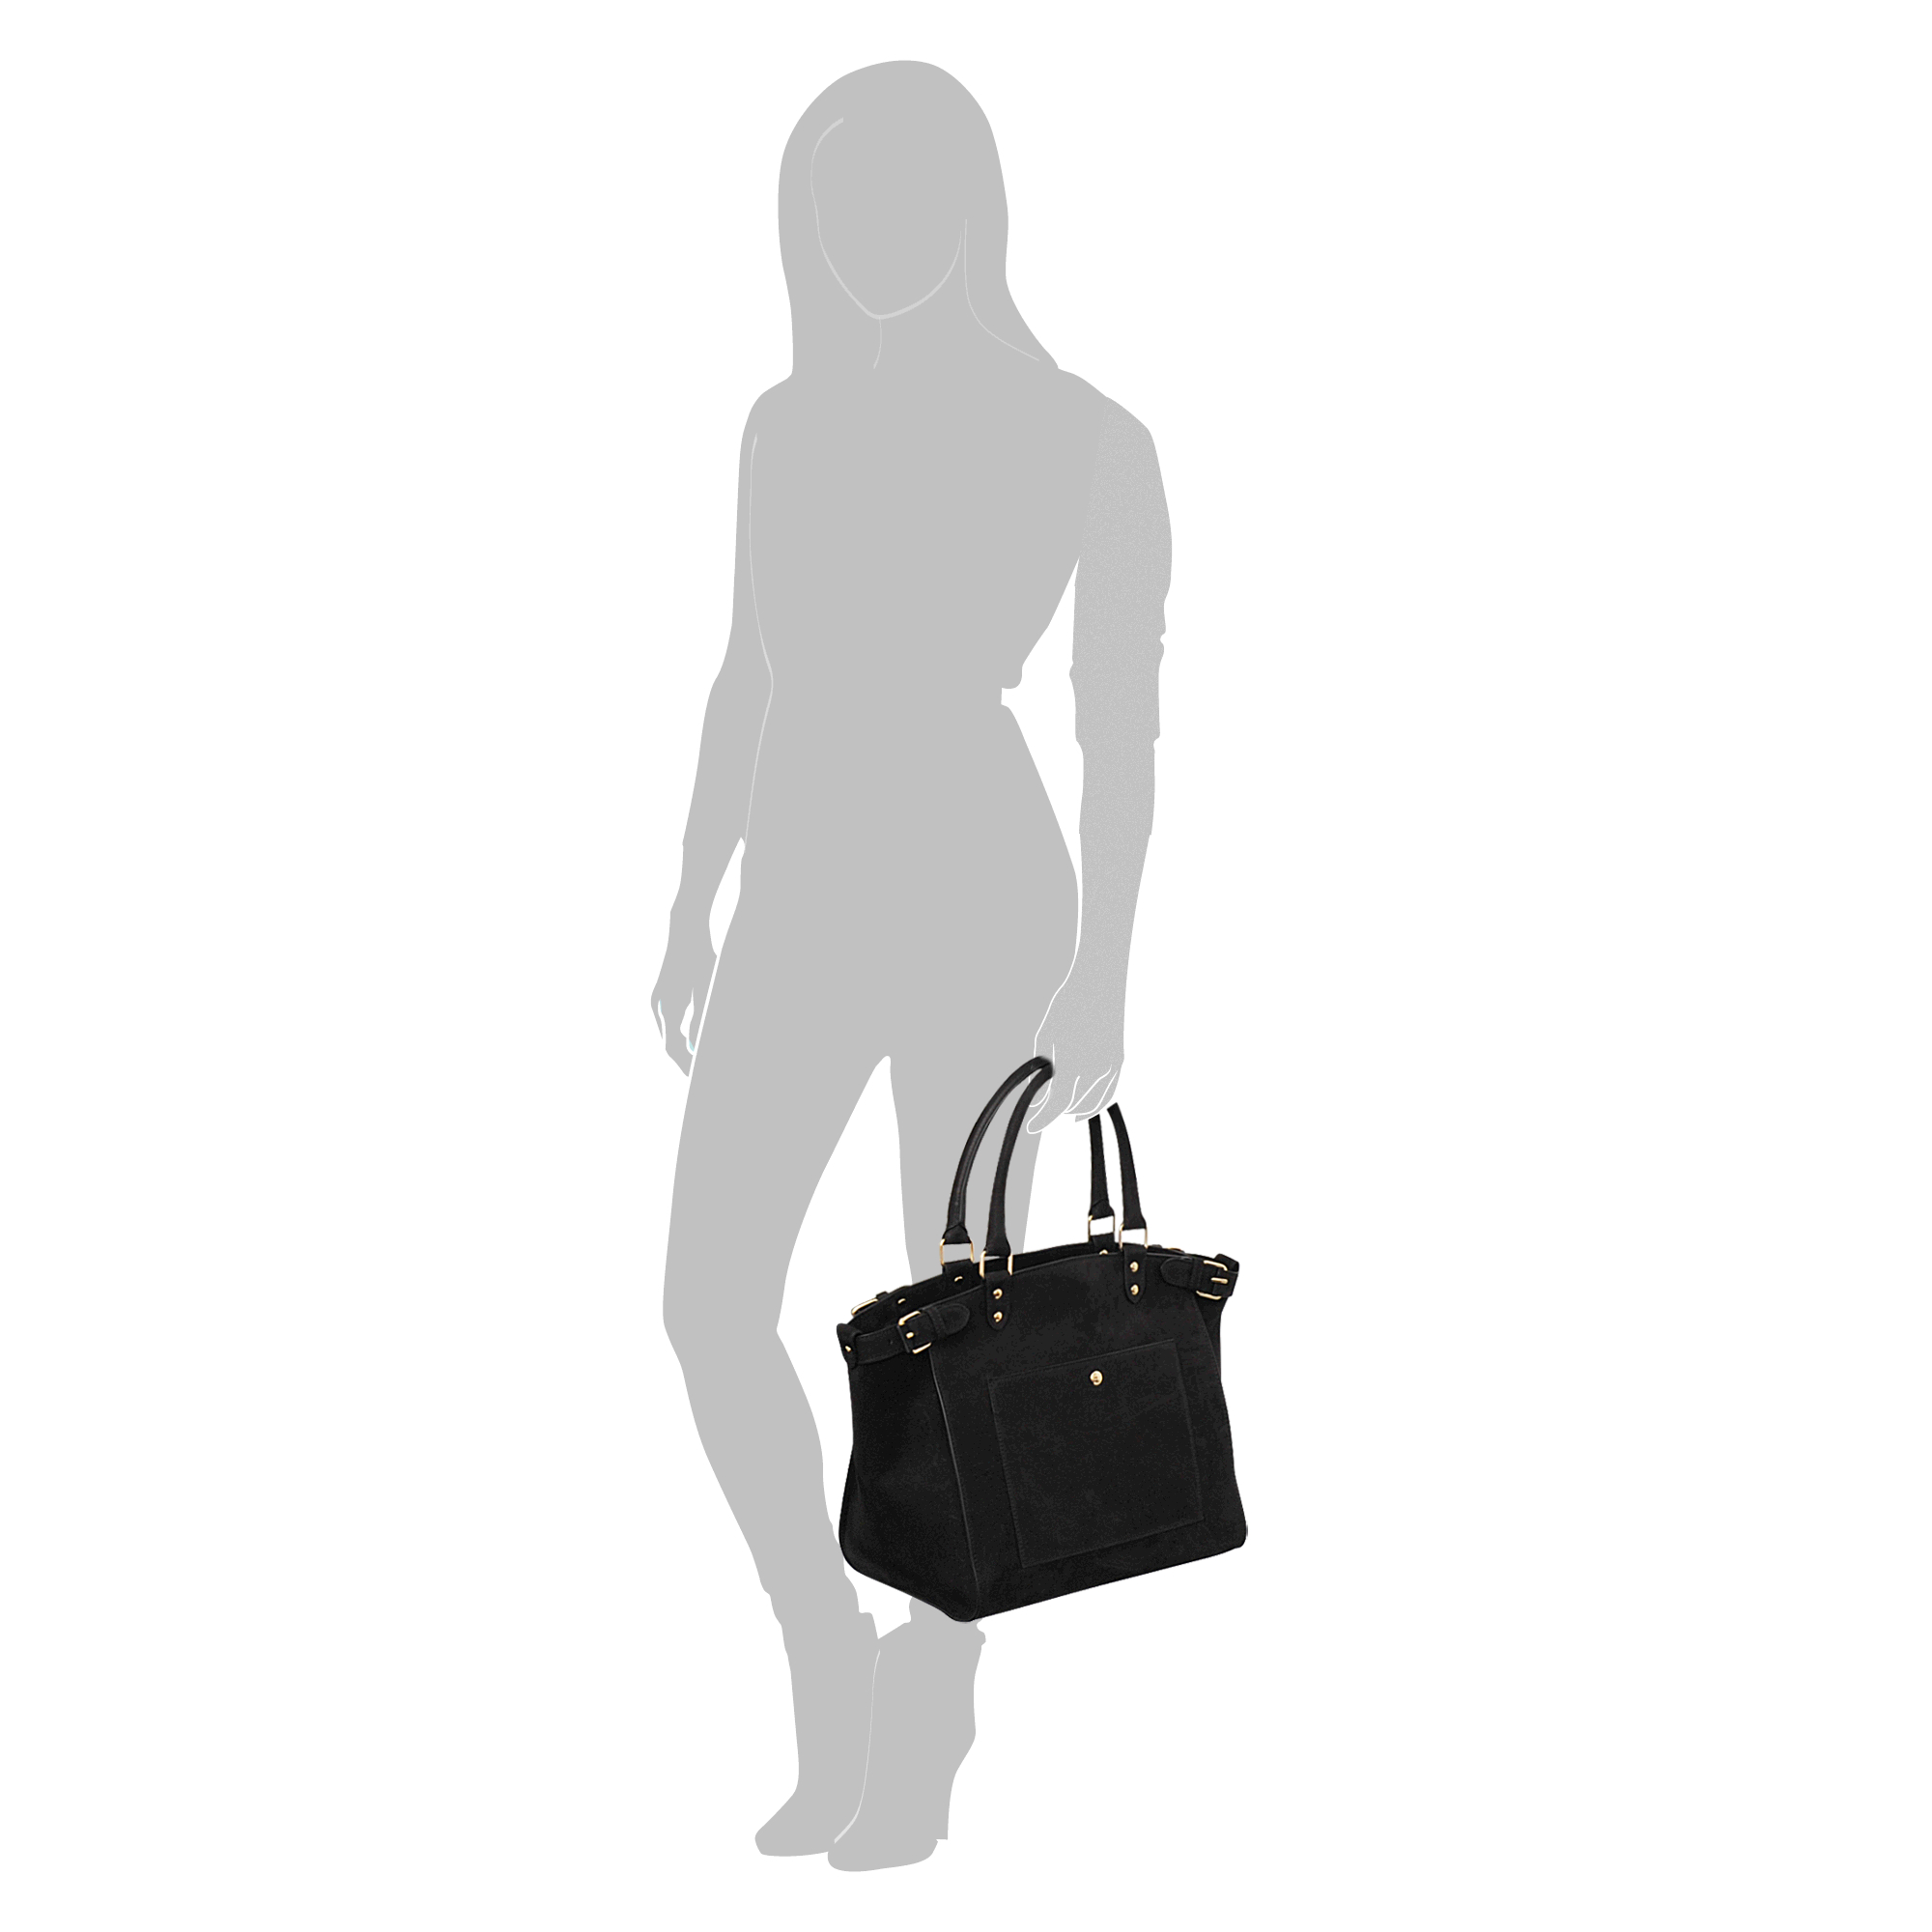 chloe bag price - Vanessa bruno Eclipse Large Bag in Black | Lyst